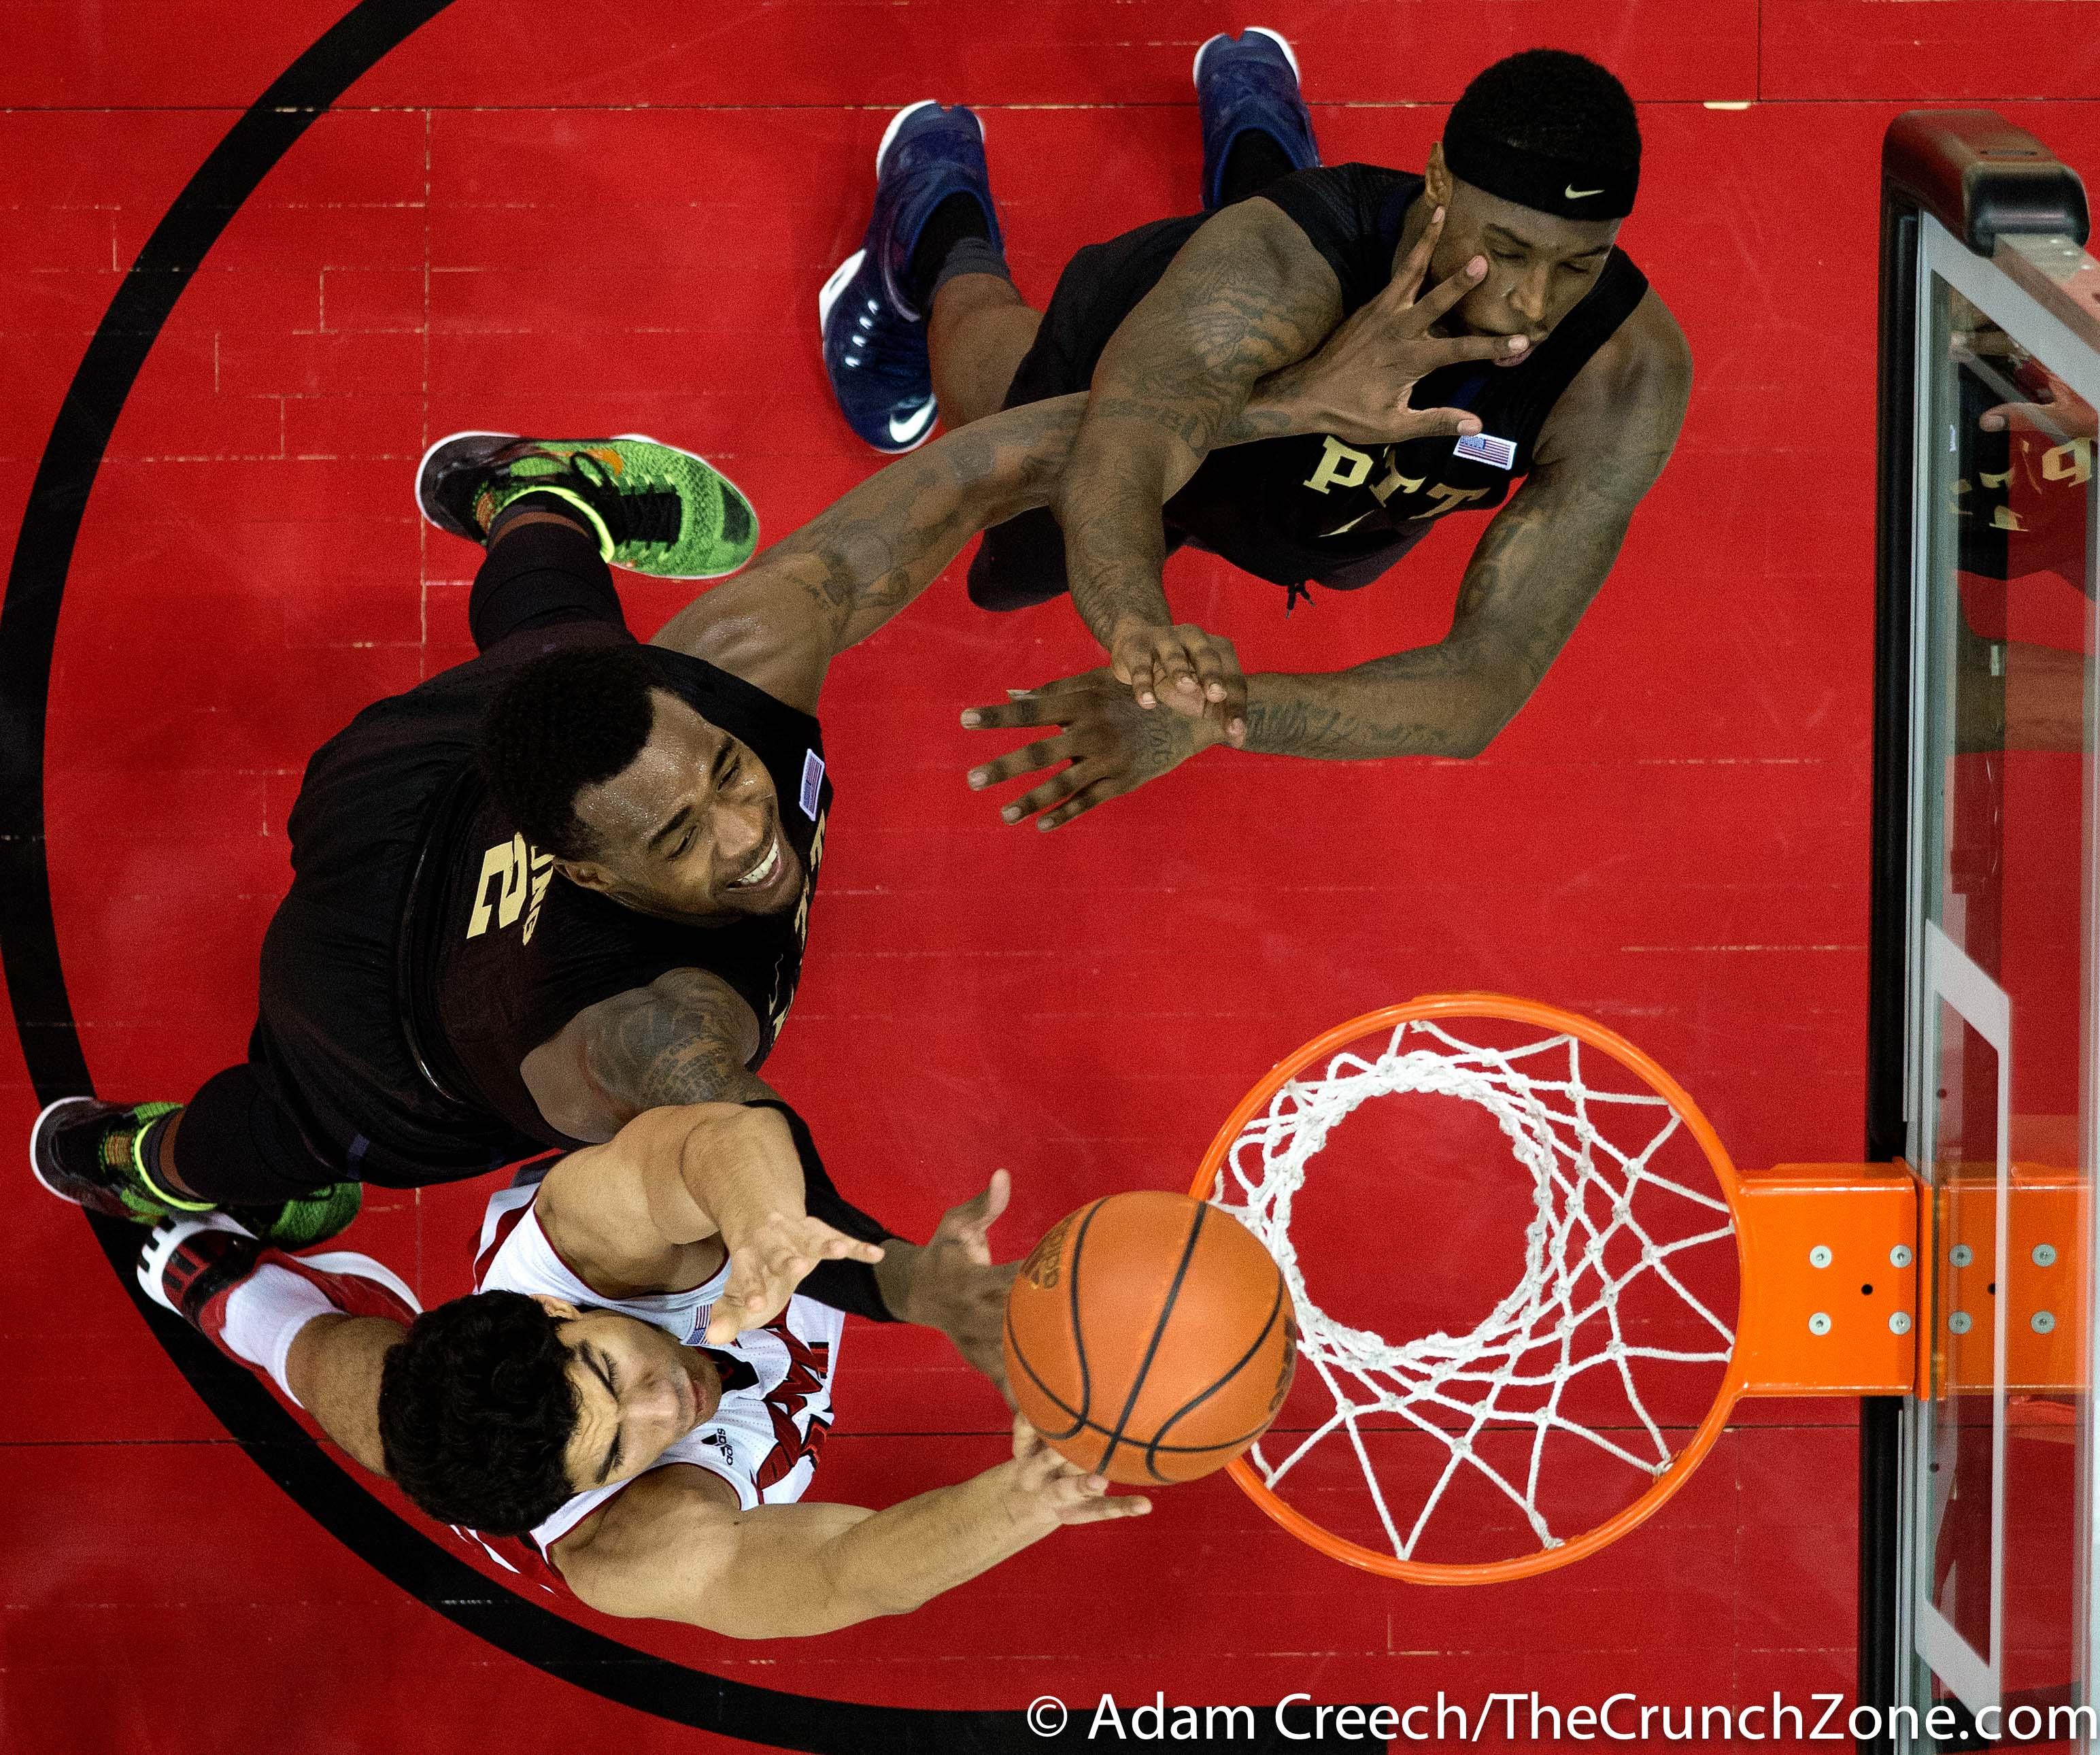 Anas Mahmoud Louisville vs. Pittsburgh 2-11-2015 Photo by Adam Creech